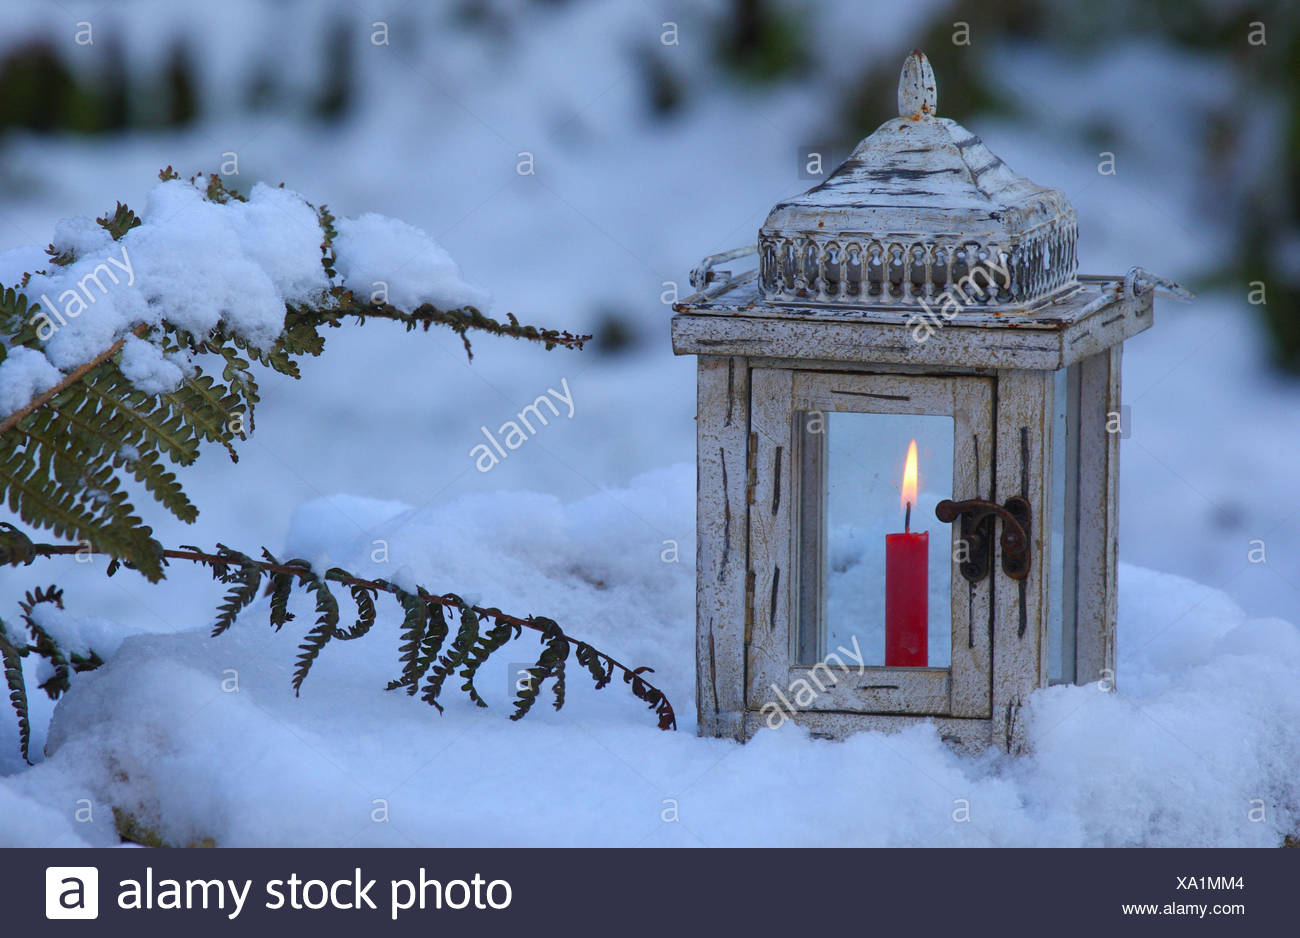 laterne kerze brennen schnee kerzenlicht flamme garten lampe licht winter gemrany. Black Bedroom Furniture Sets. Home Design Ideas